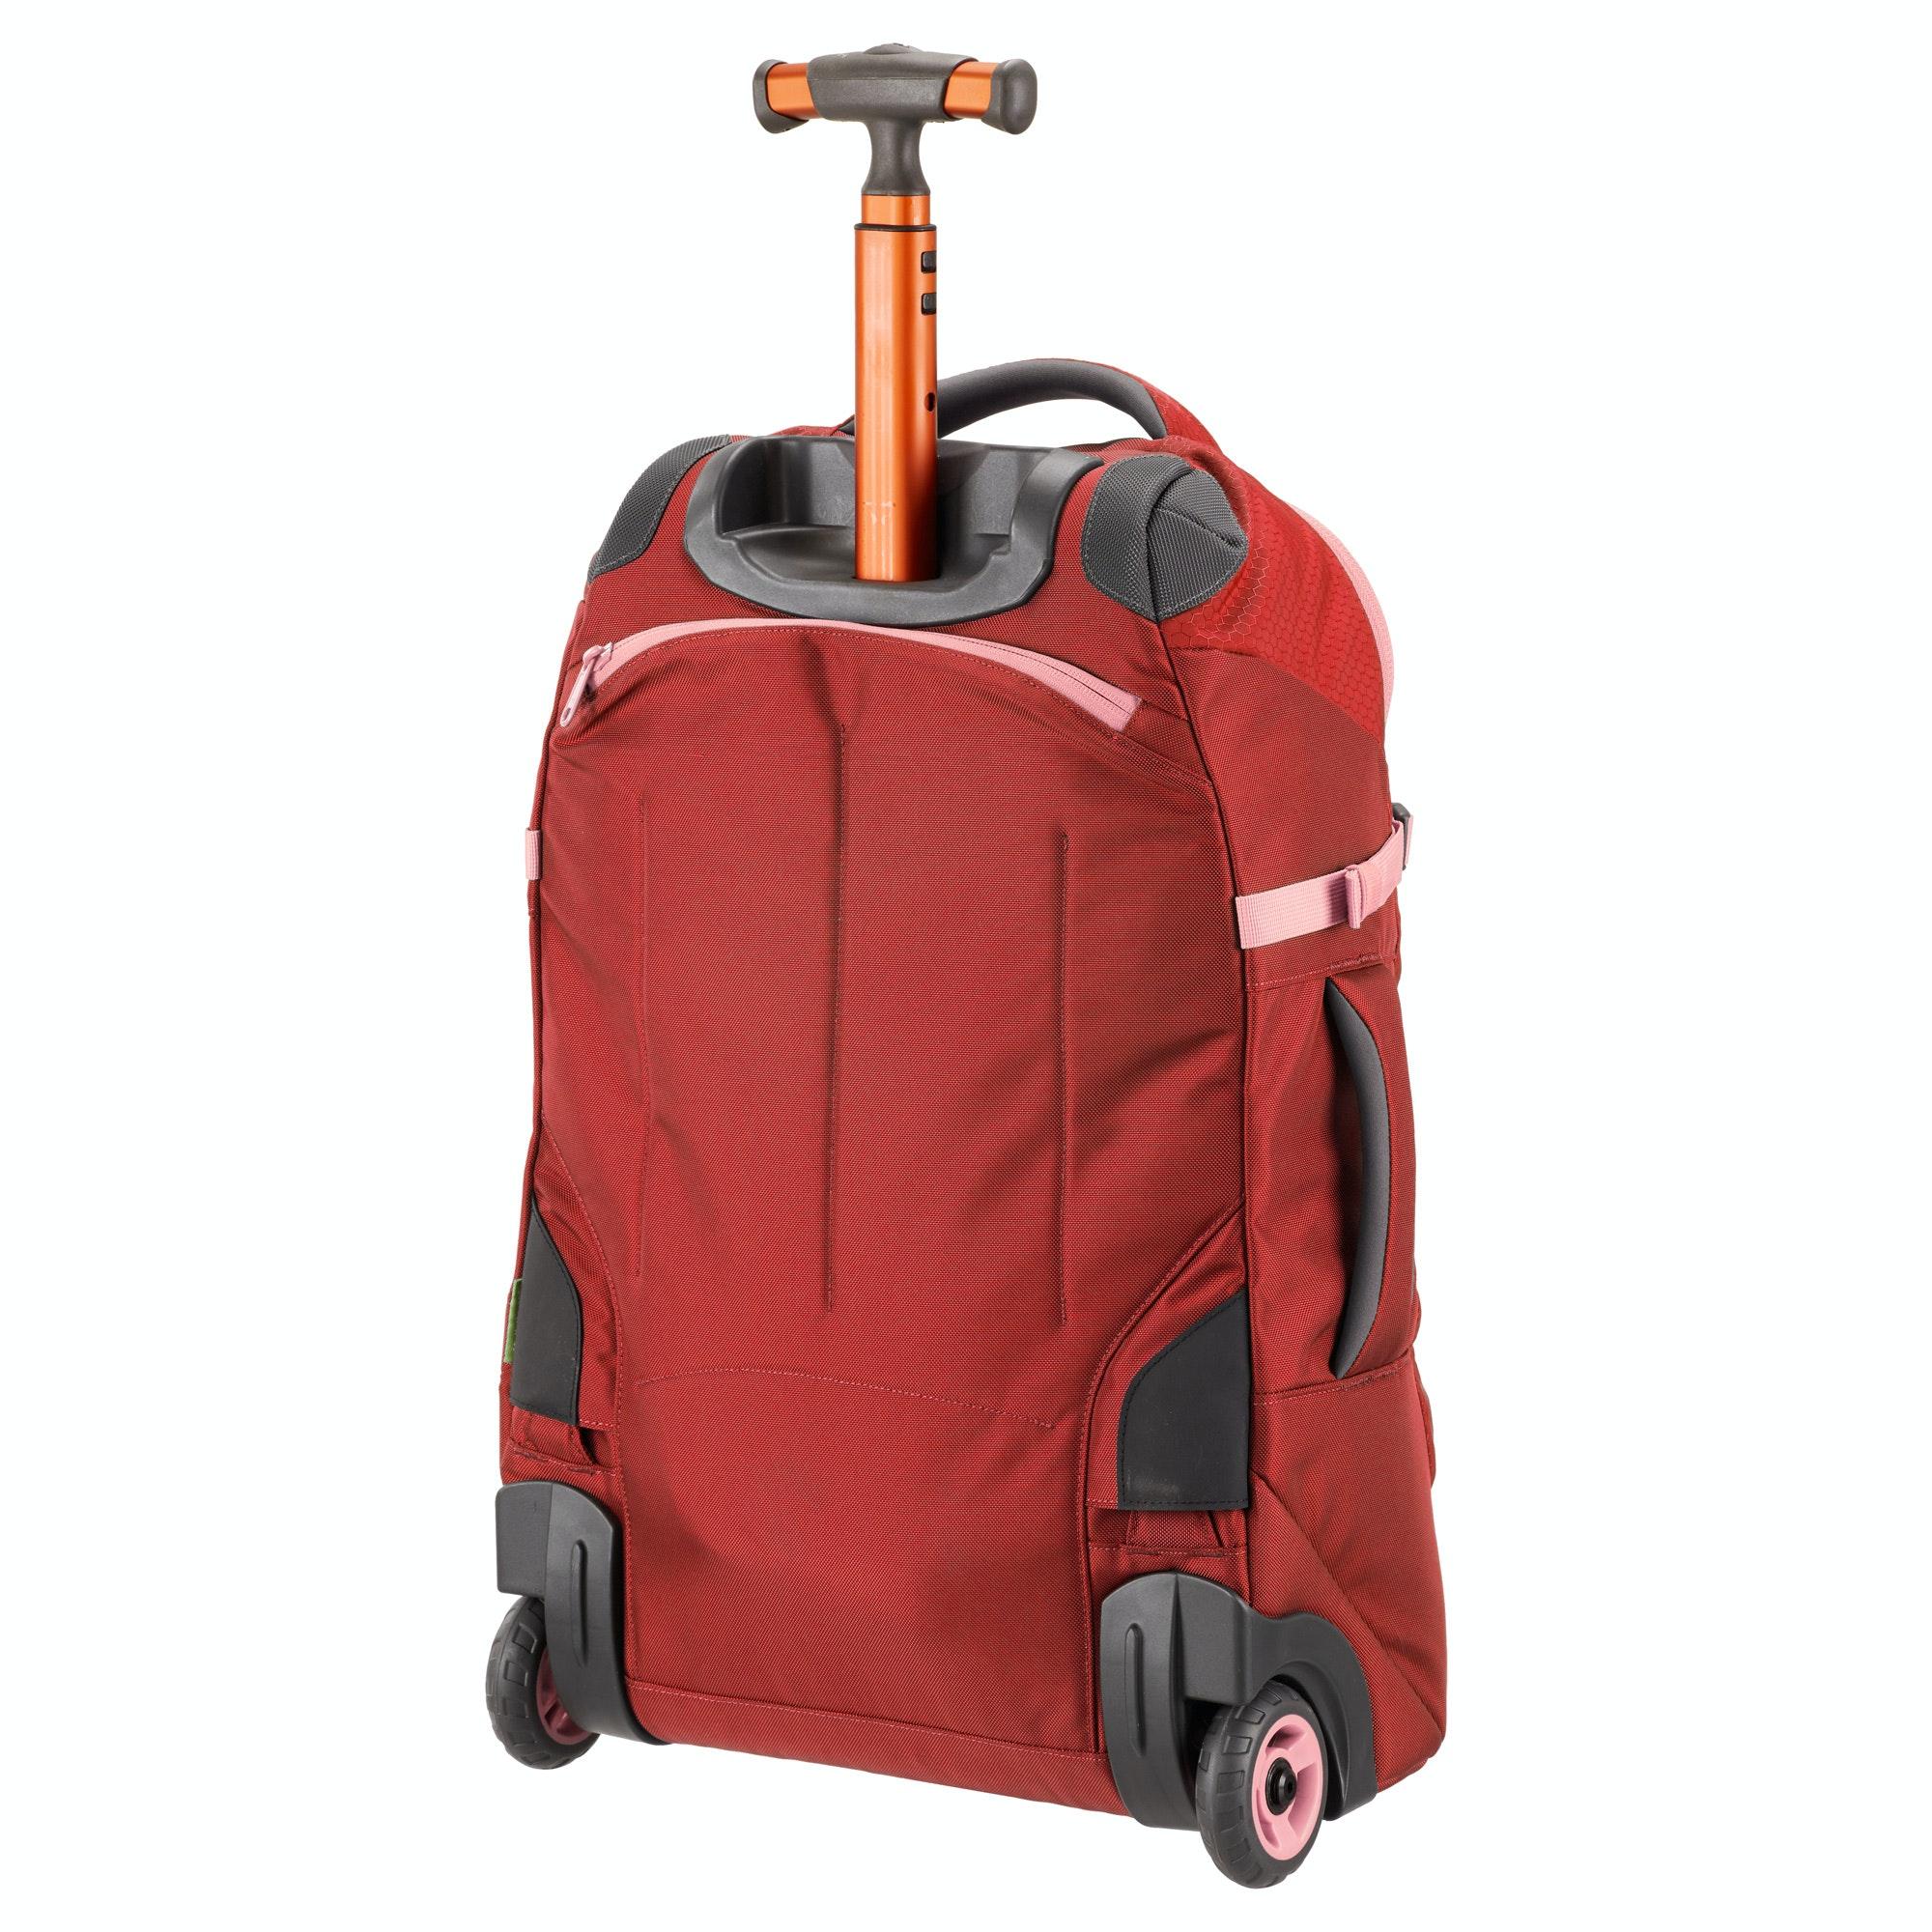 kathmandu hybrid 30l carry on luggage trolley backpack harness lightweight new ebay. Black Bedroom Furniture Sets. Home Design Ideas